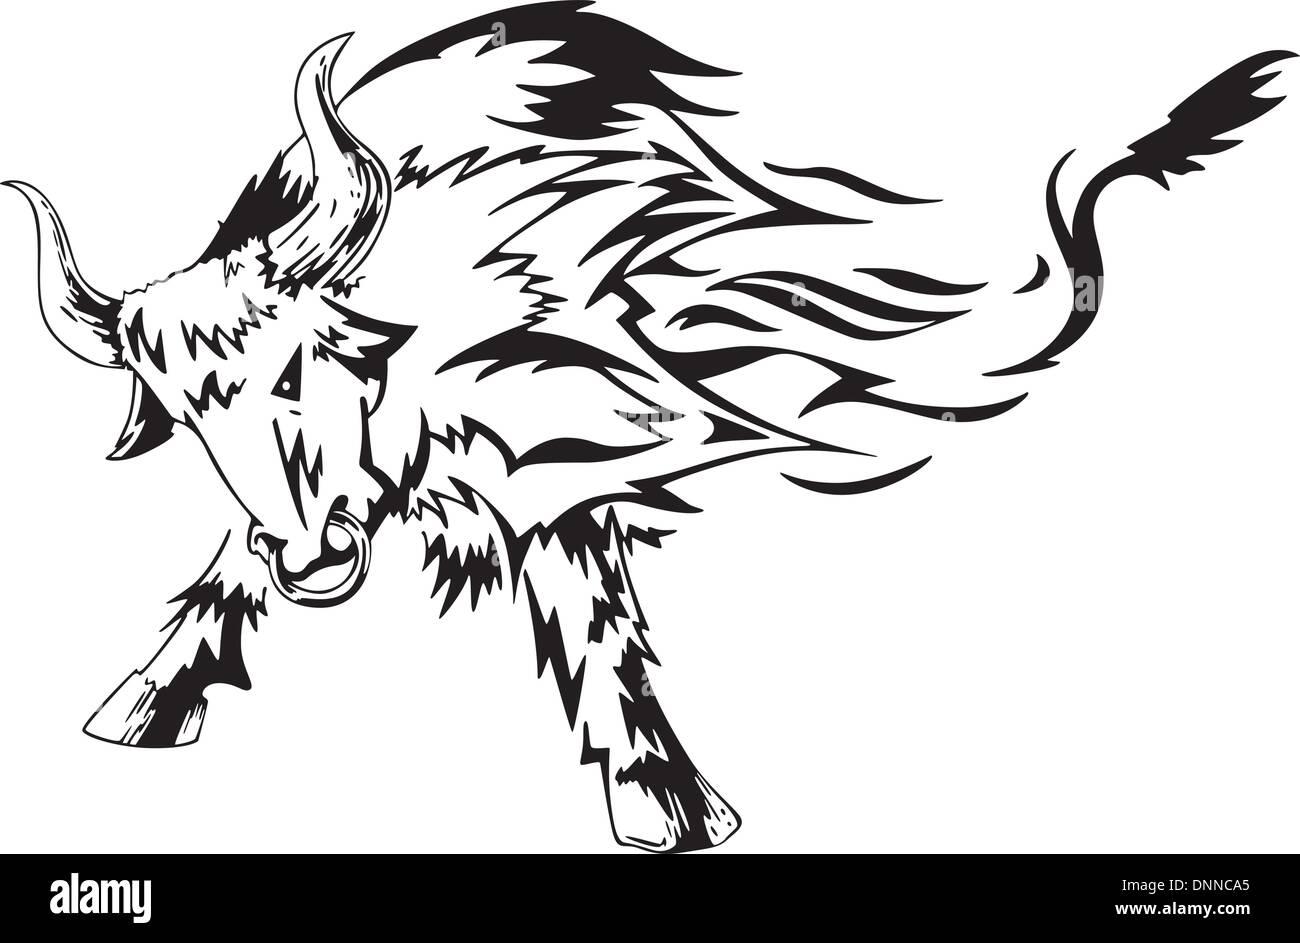 Bull Tatouage Tribal Noir Et Blanc Vector Illustration Vecteurs Et